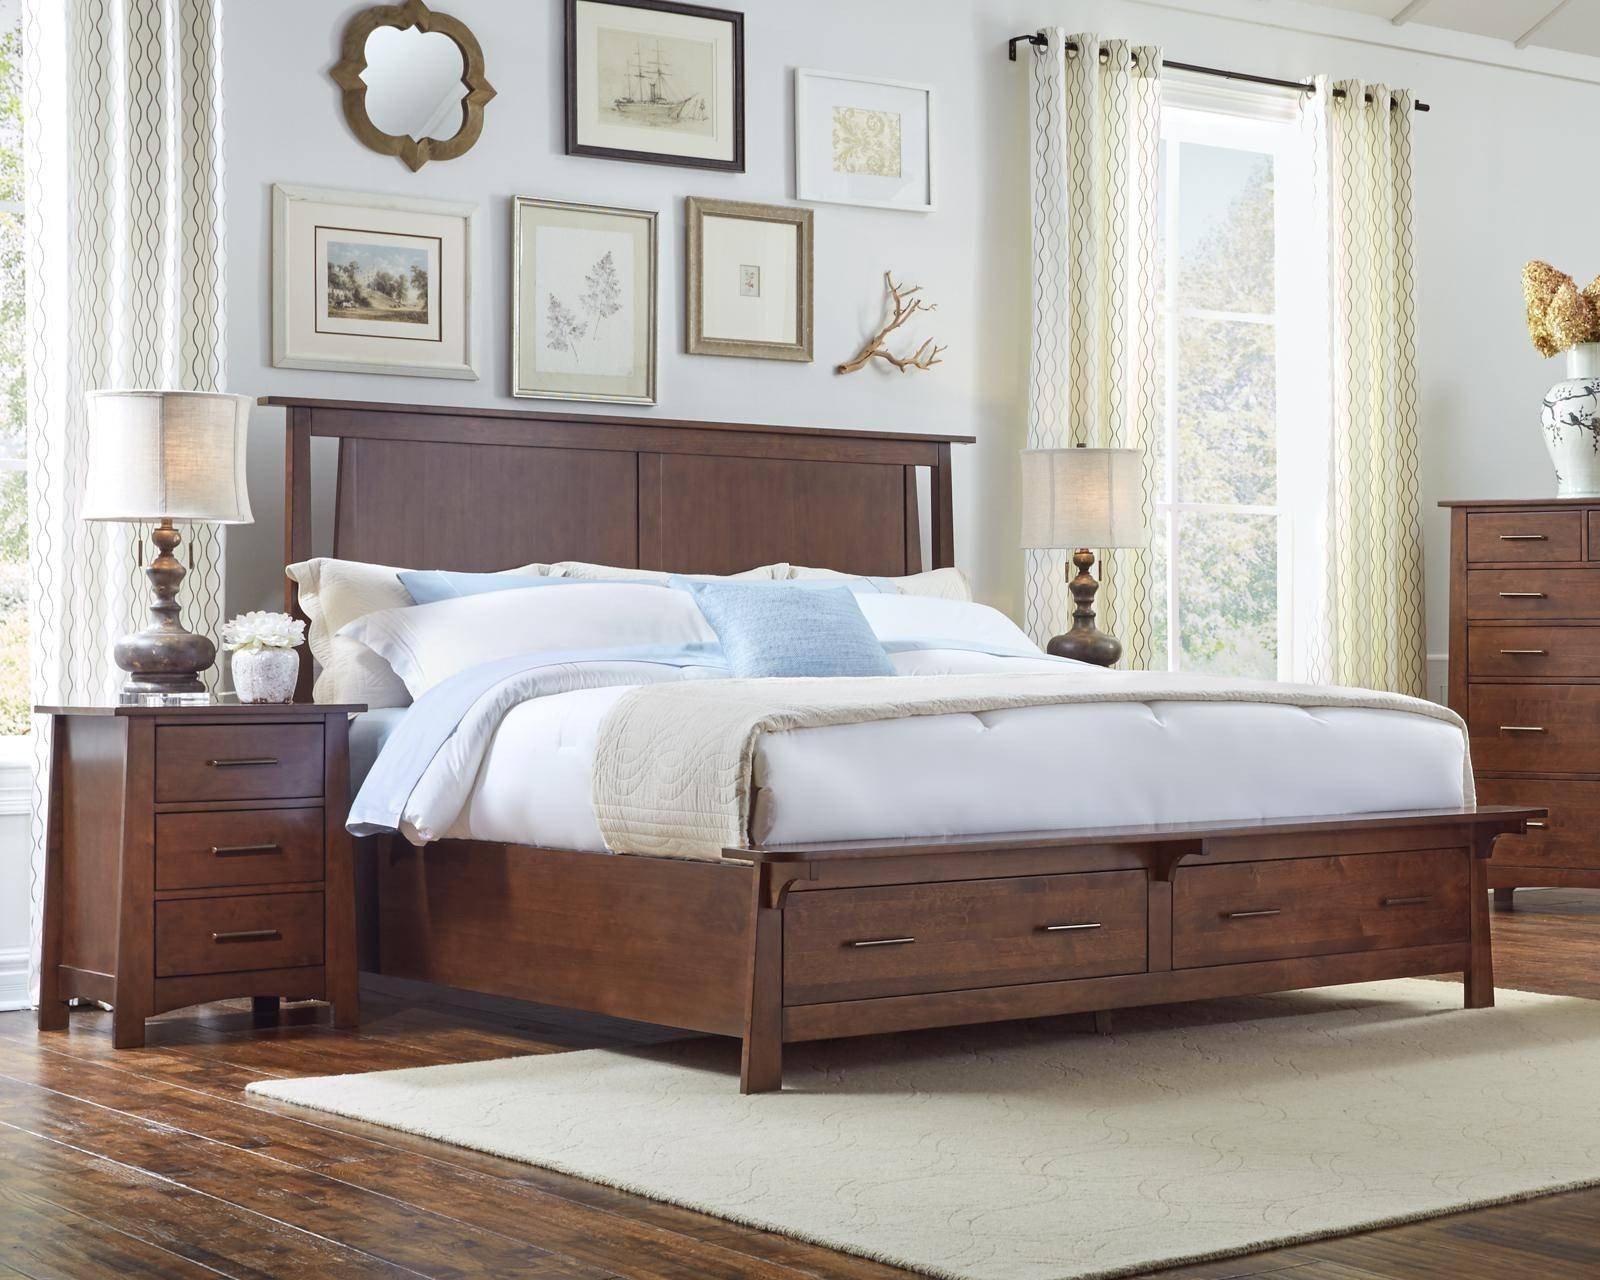 Mission Style Bedroom Furniture Luxury Modern King Storage Bedroom Set 5pcs Sumatra Brown sodwb5131